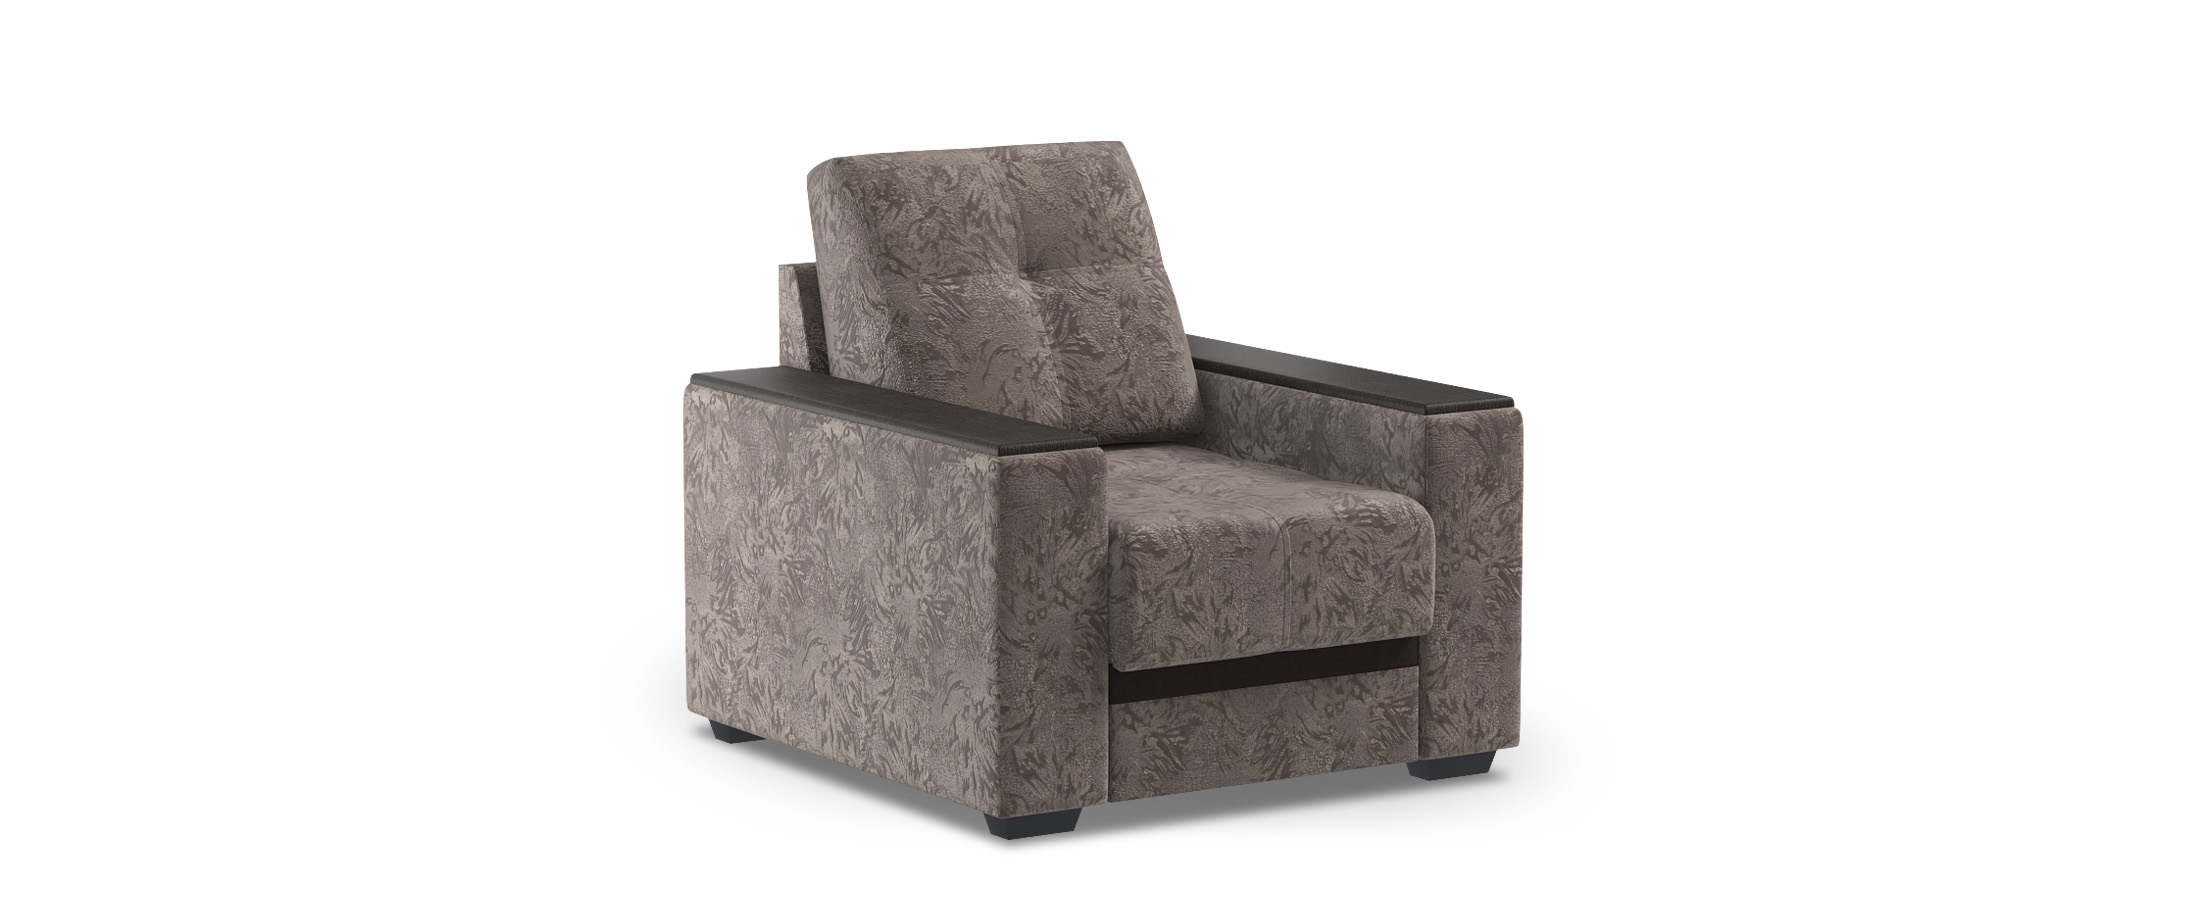 Кресло тканевое Атланта 066 от MOON TRADE